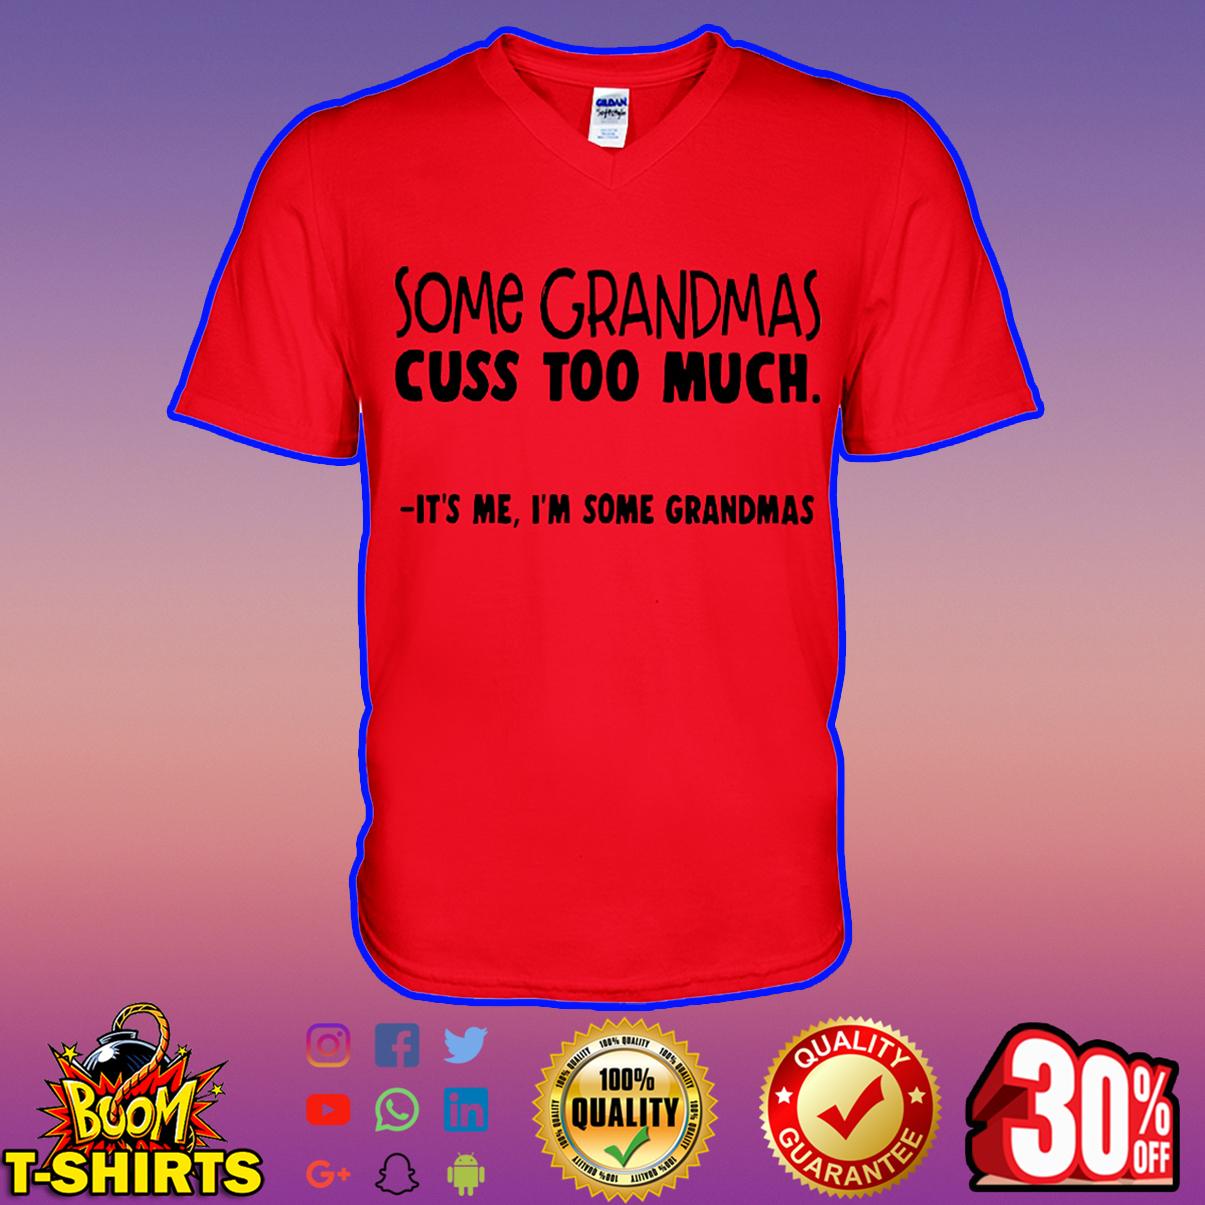 Some grandmas cuss too much it's me I'm some grandmas v-neck